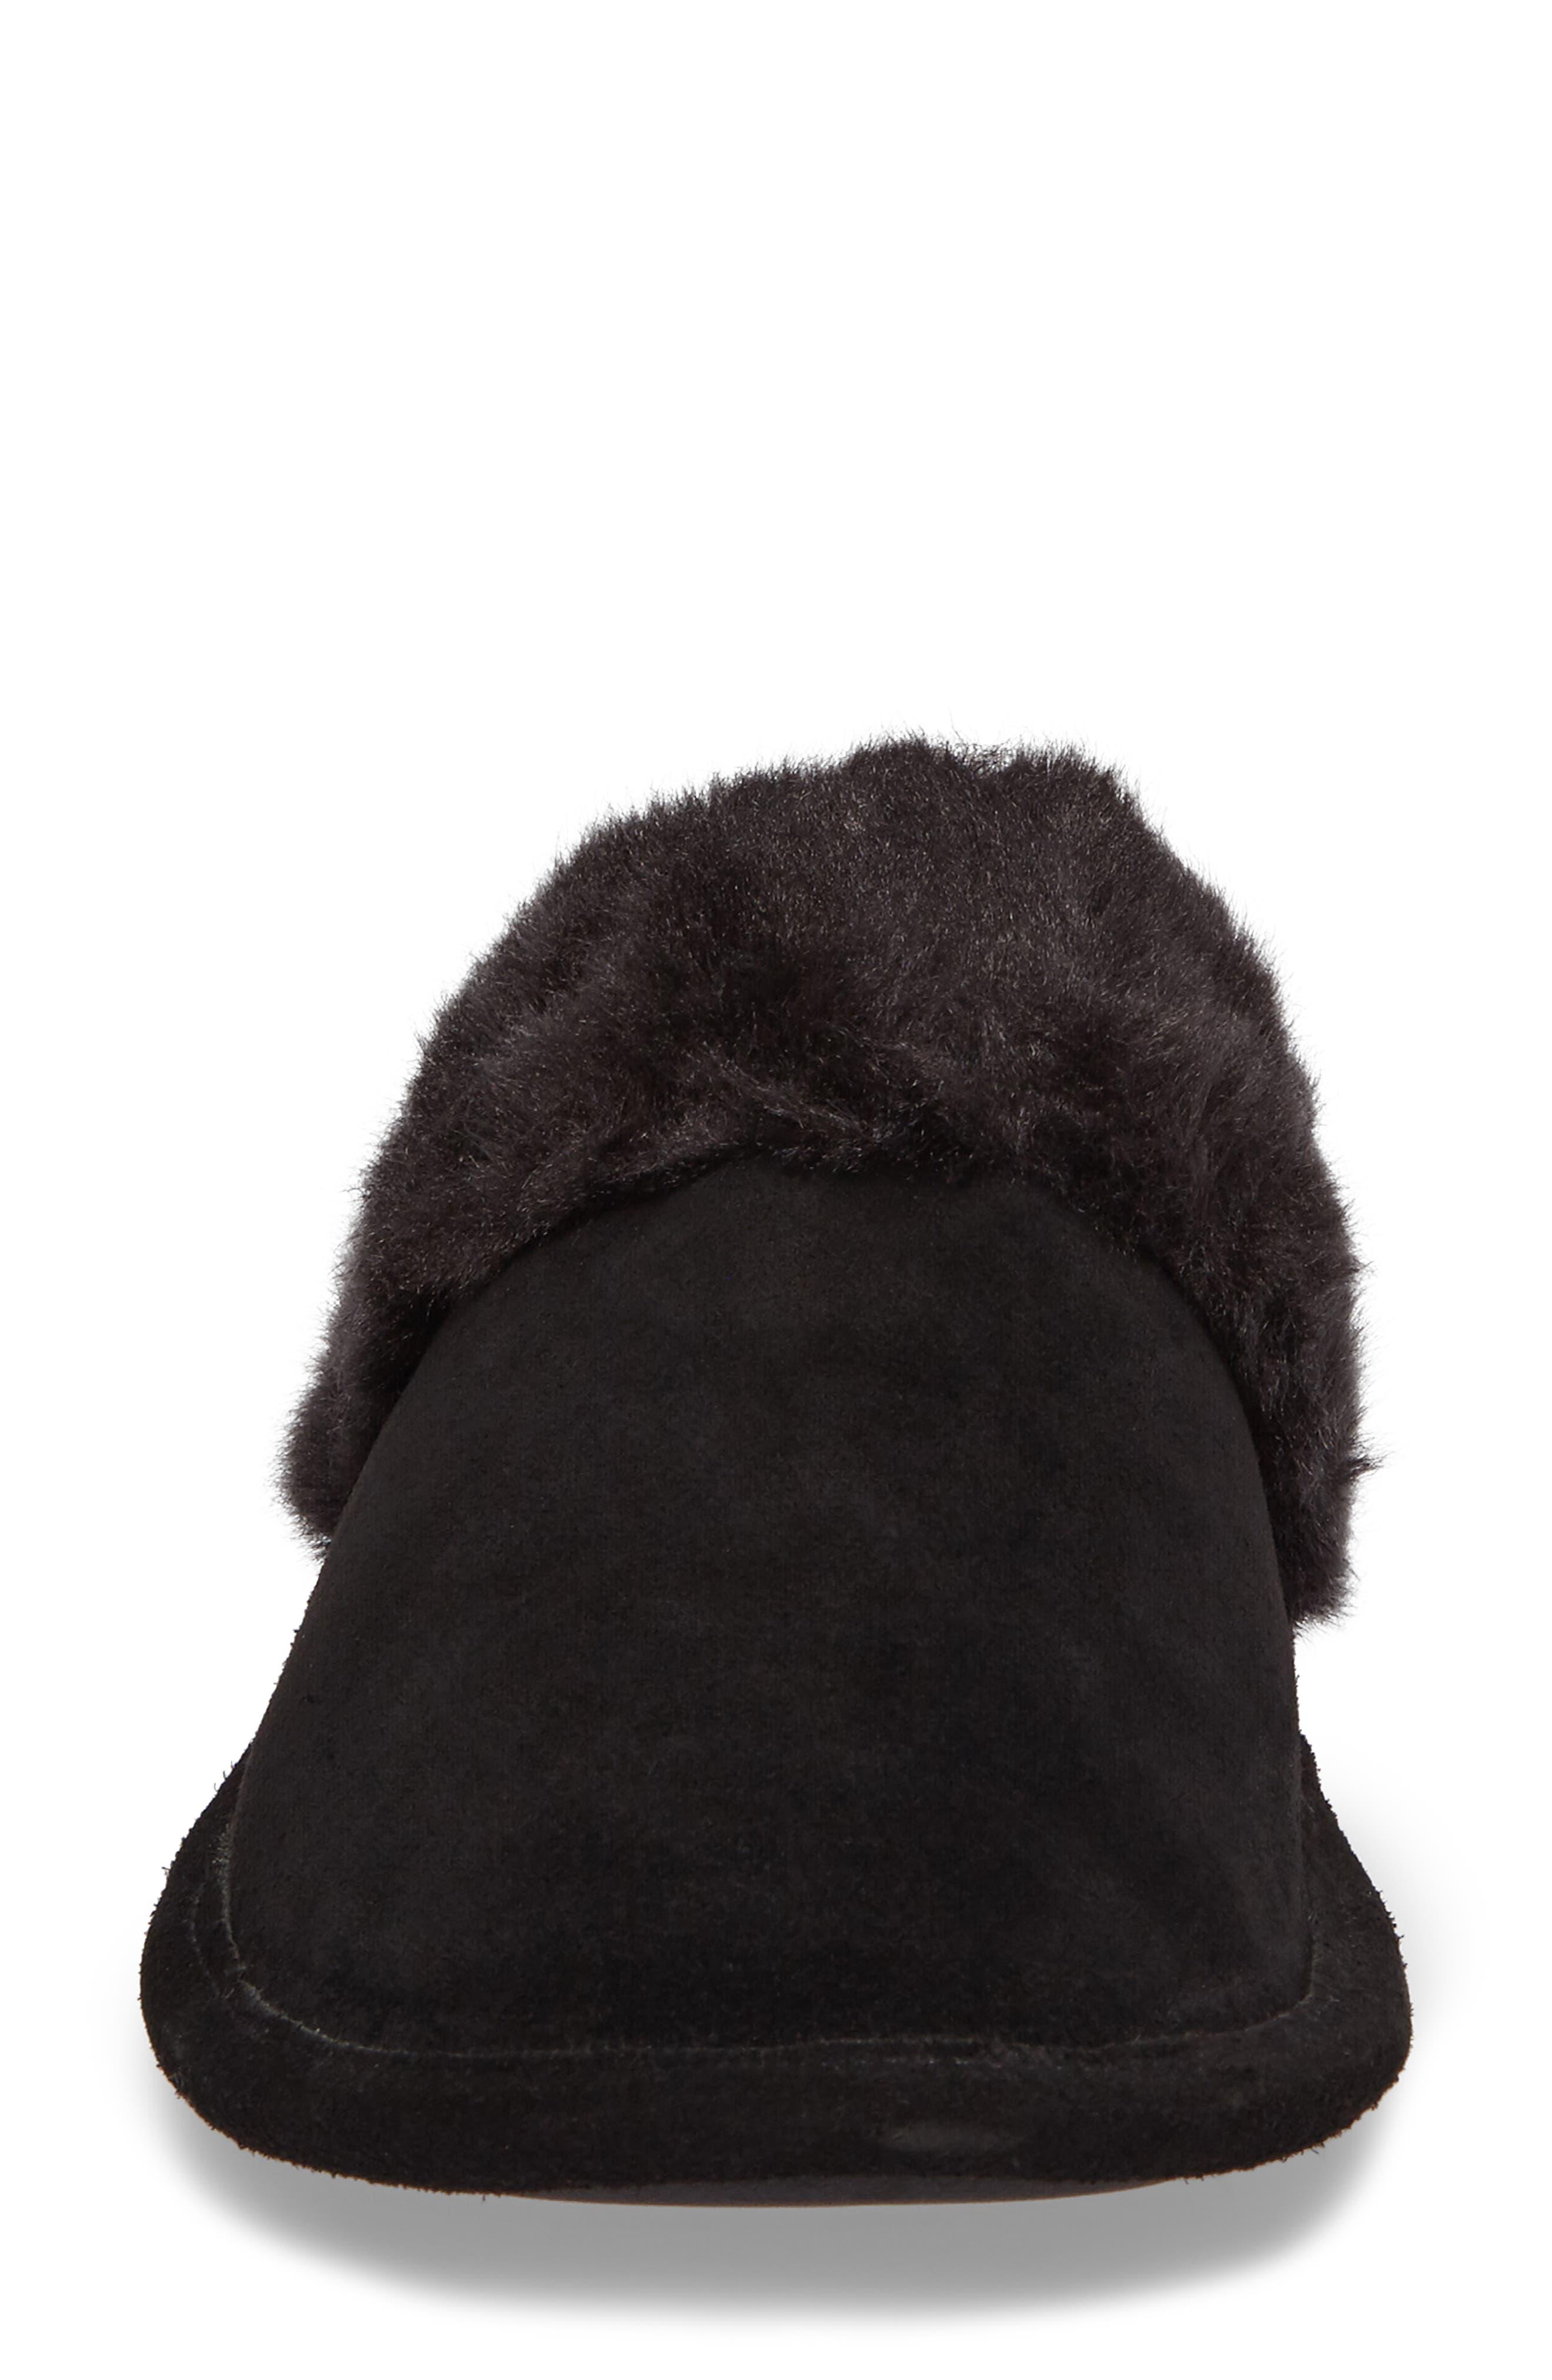 Pammy Faux Fur Slipper,                             Alternate thumbnail 4, color,                             001